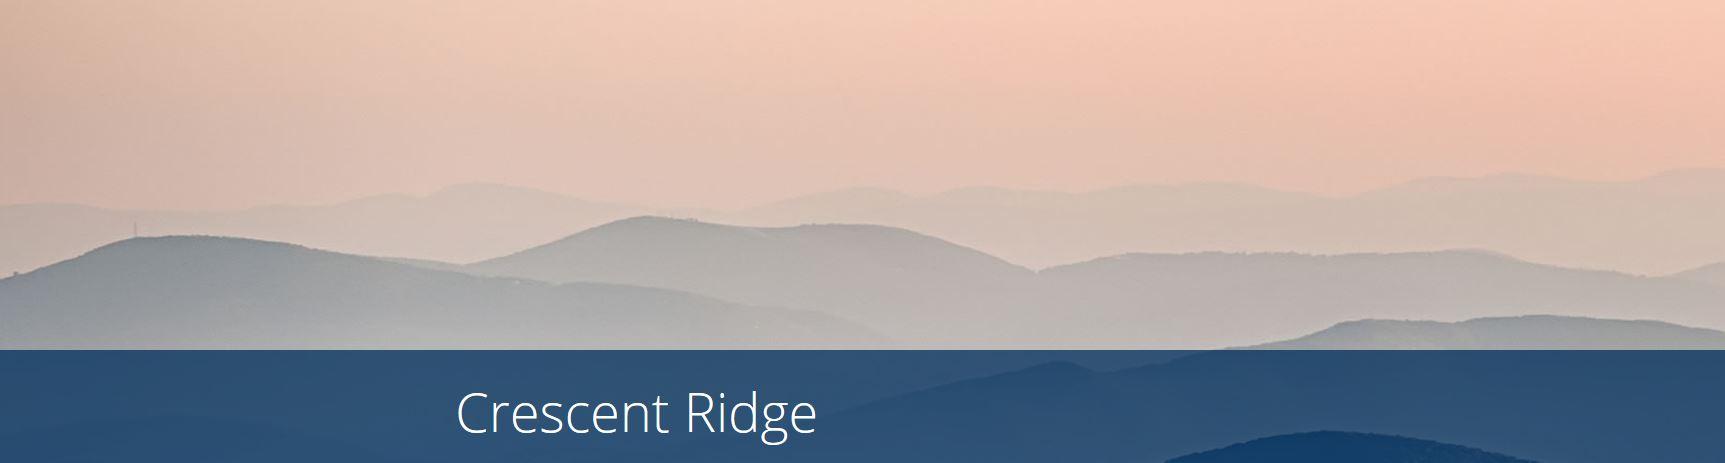 Crescent Ridge Capital Partners